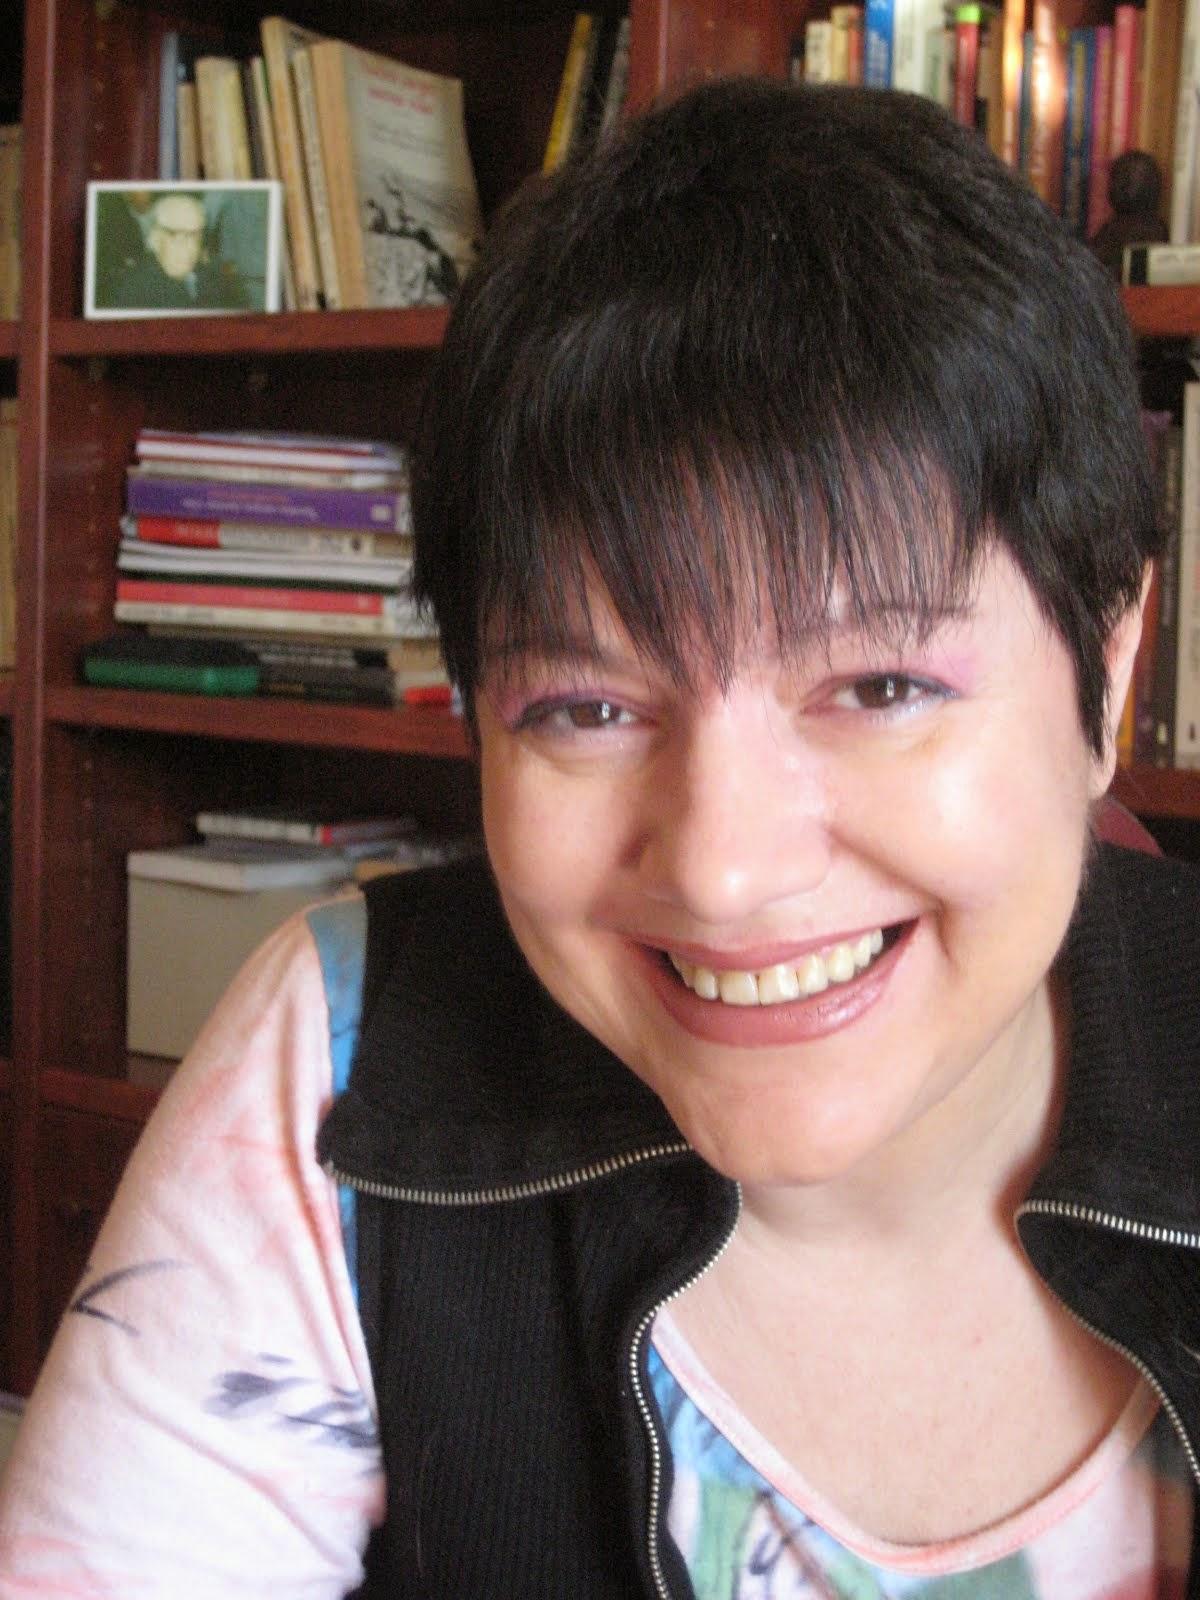 Montserrat Calvo